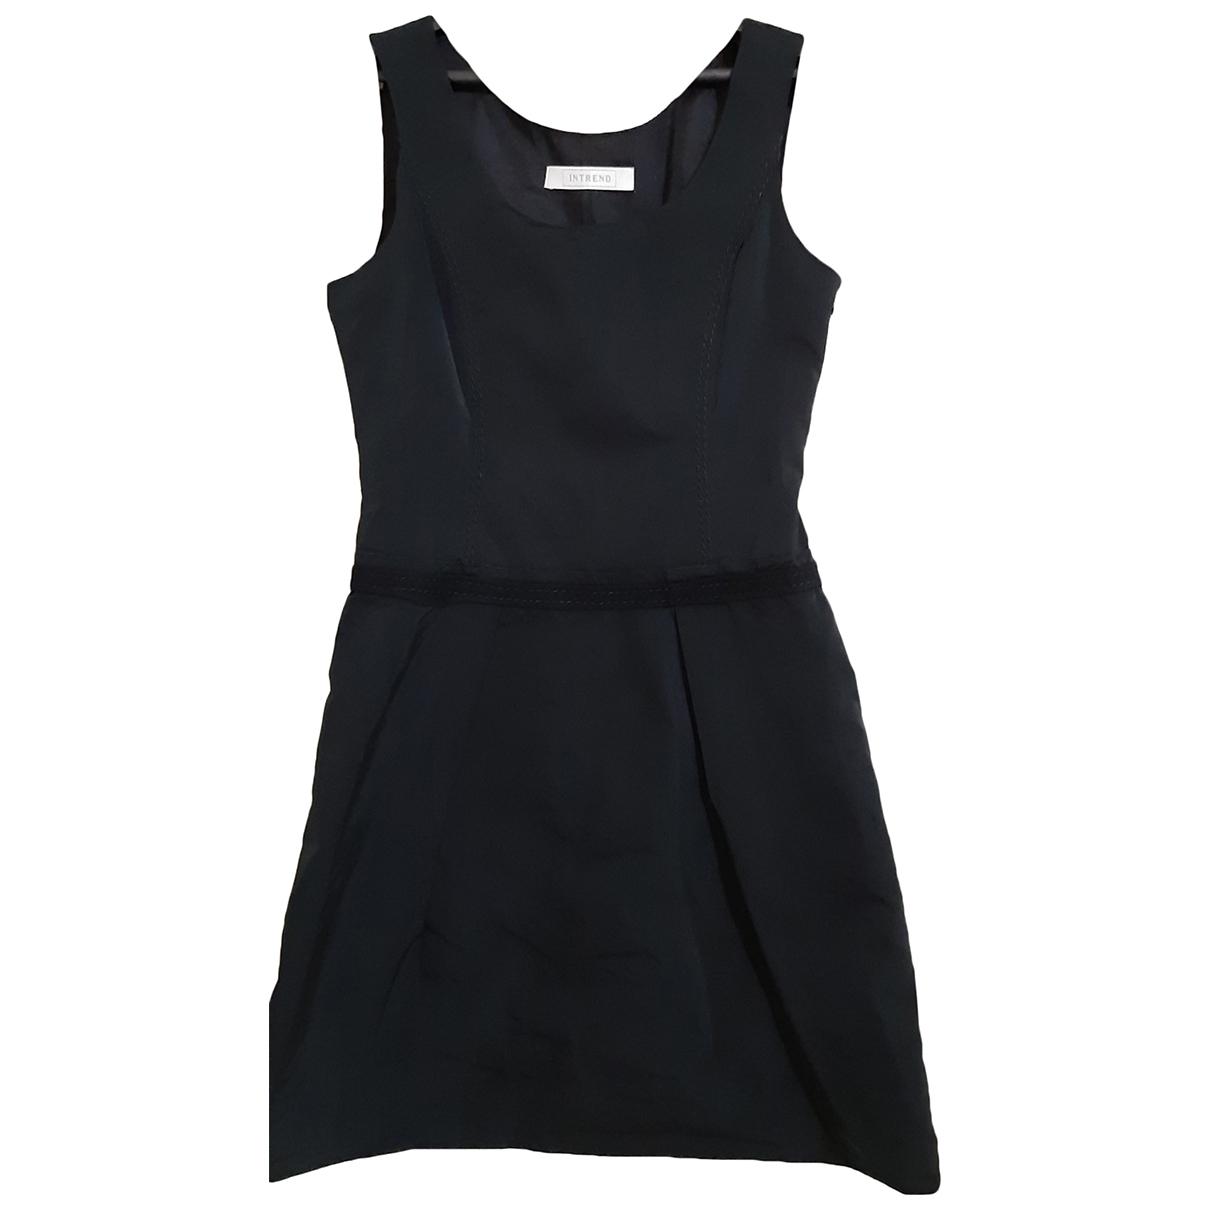 Intrend \N Black dress for Women 44 FR